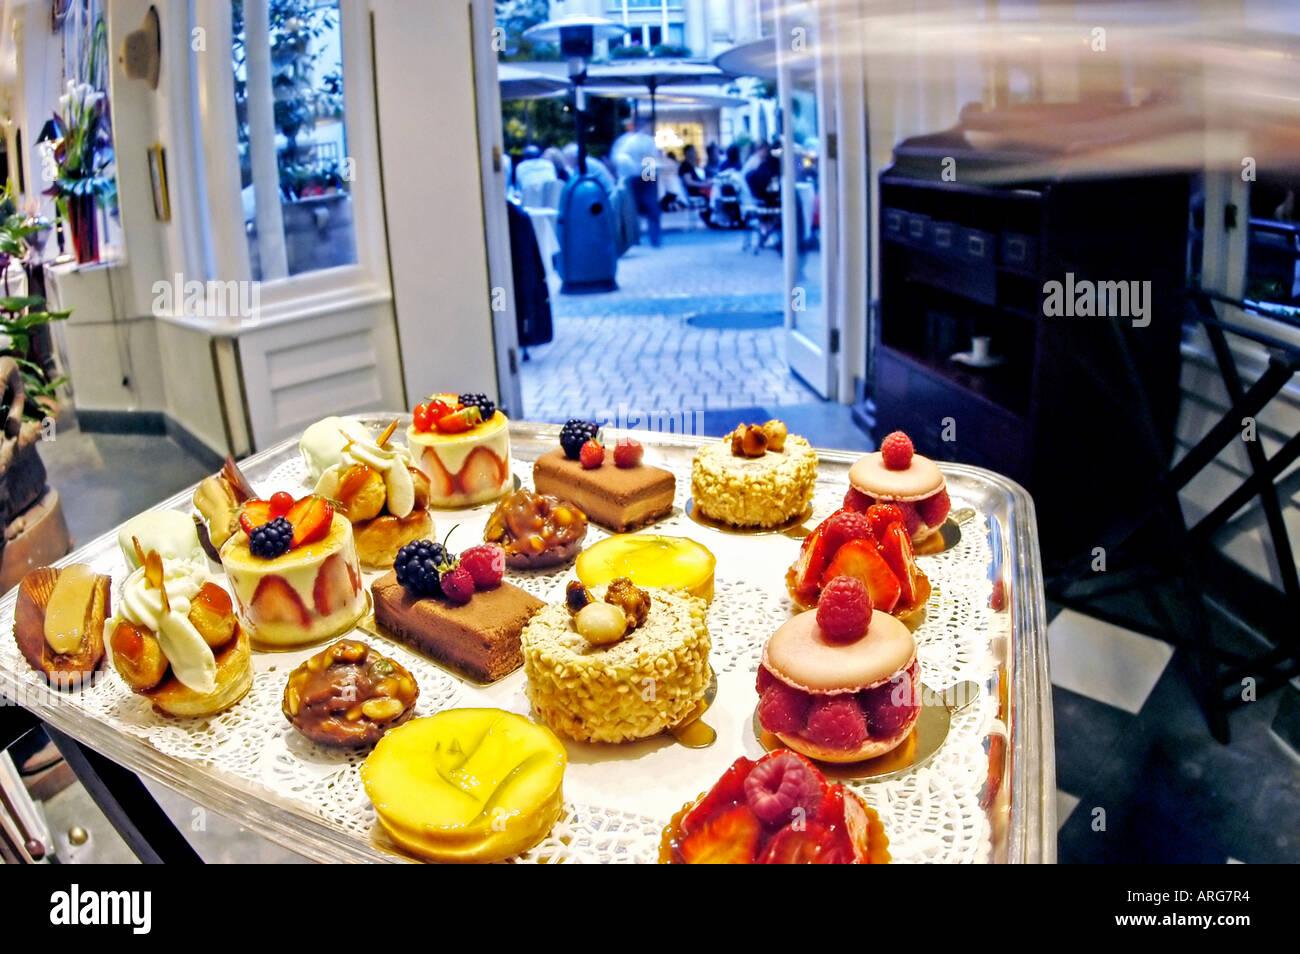 Paris france contemporary french restaurant la terrasse du parc at stock photo royalty free - Restaurant la terrasse paris ...